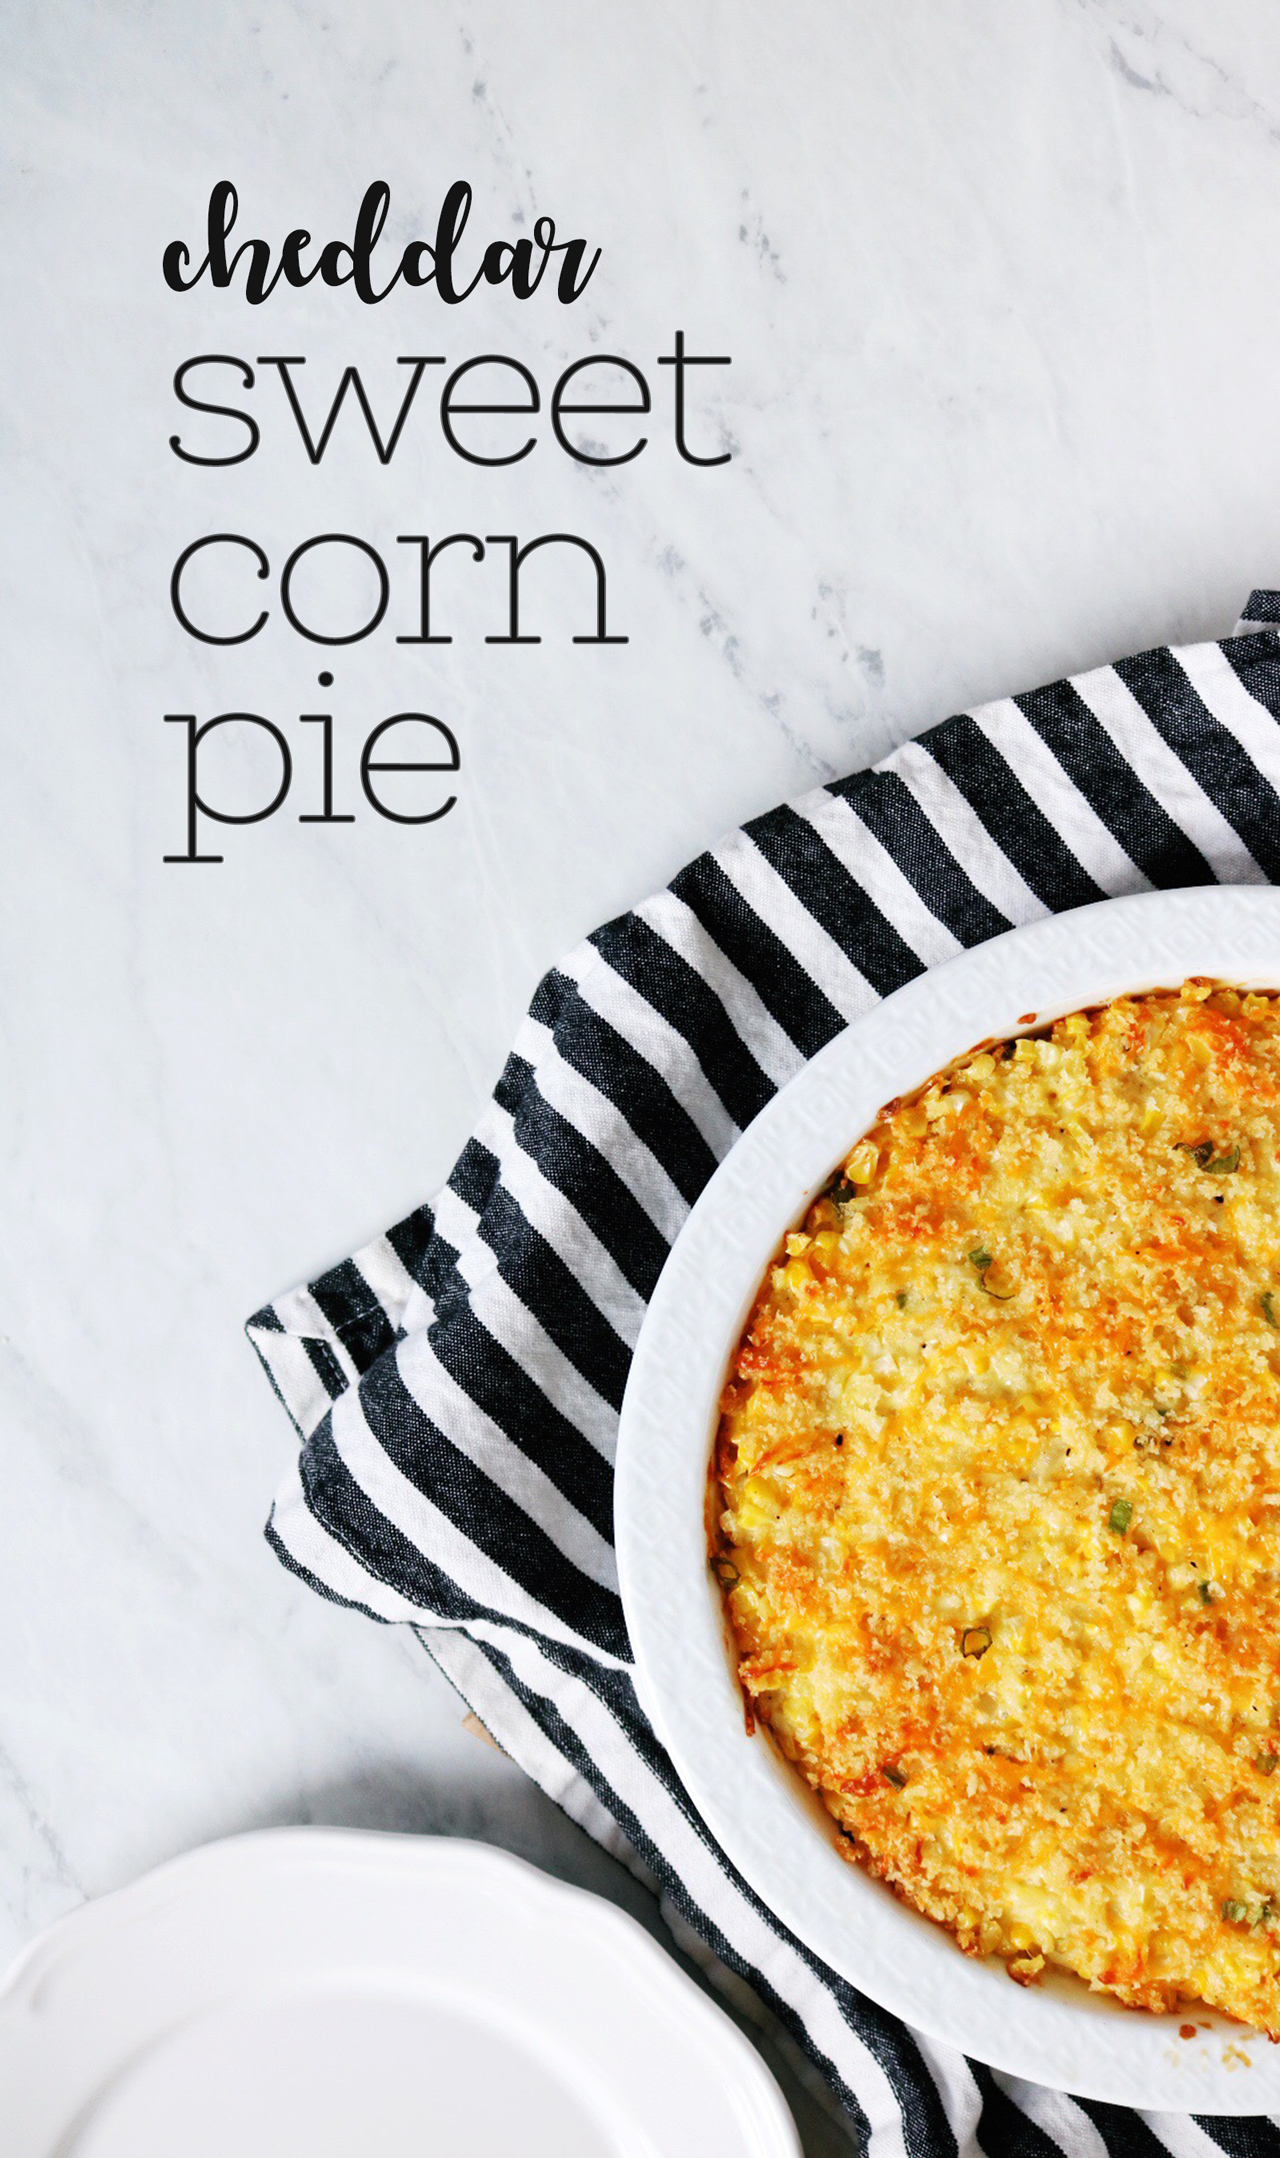 Cheddar Sweet Corn Pie recipe | via Pies Before Guys